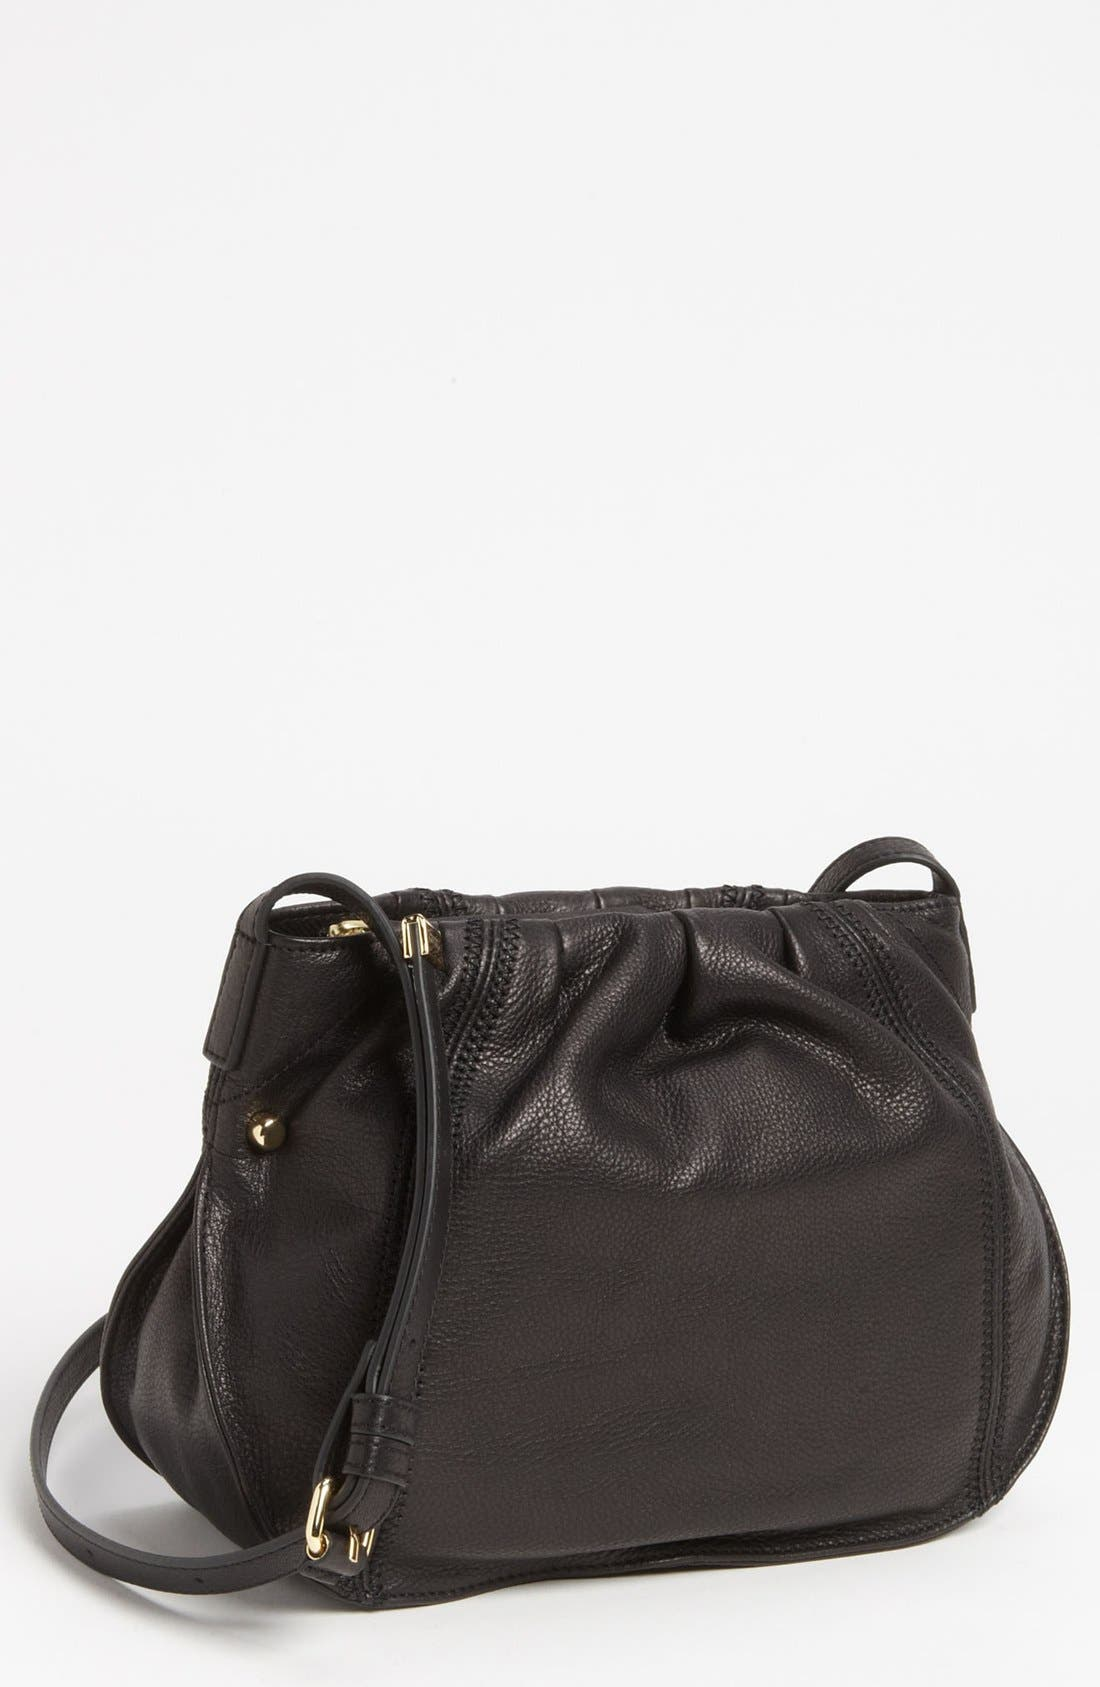 Alternate Image 1 Selected - Perlina 'Blanca' Crossbody Bag